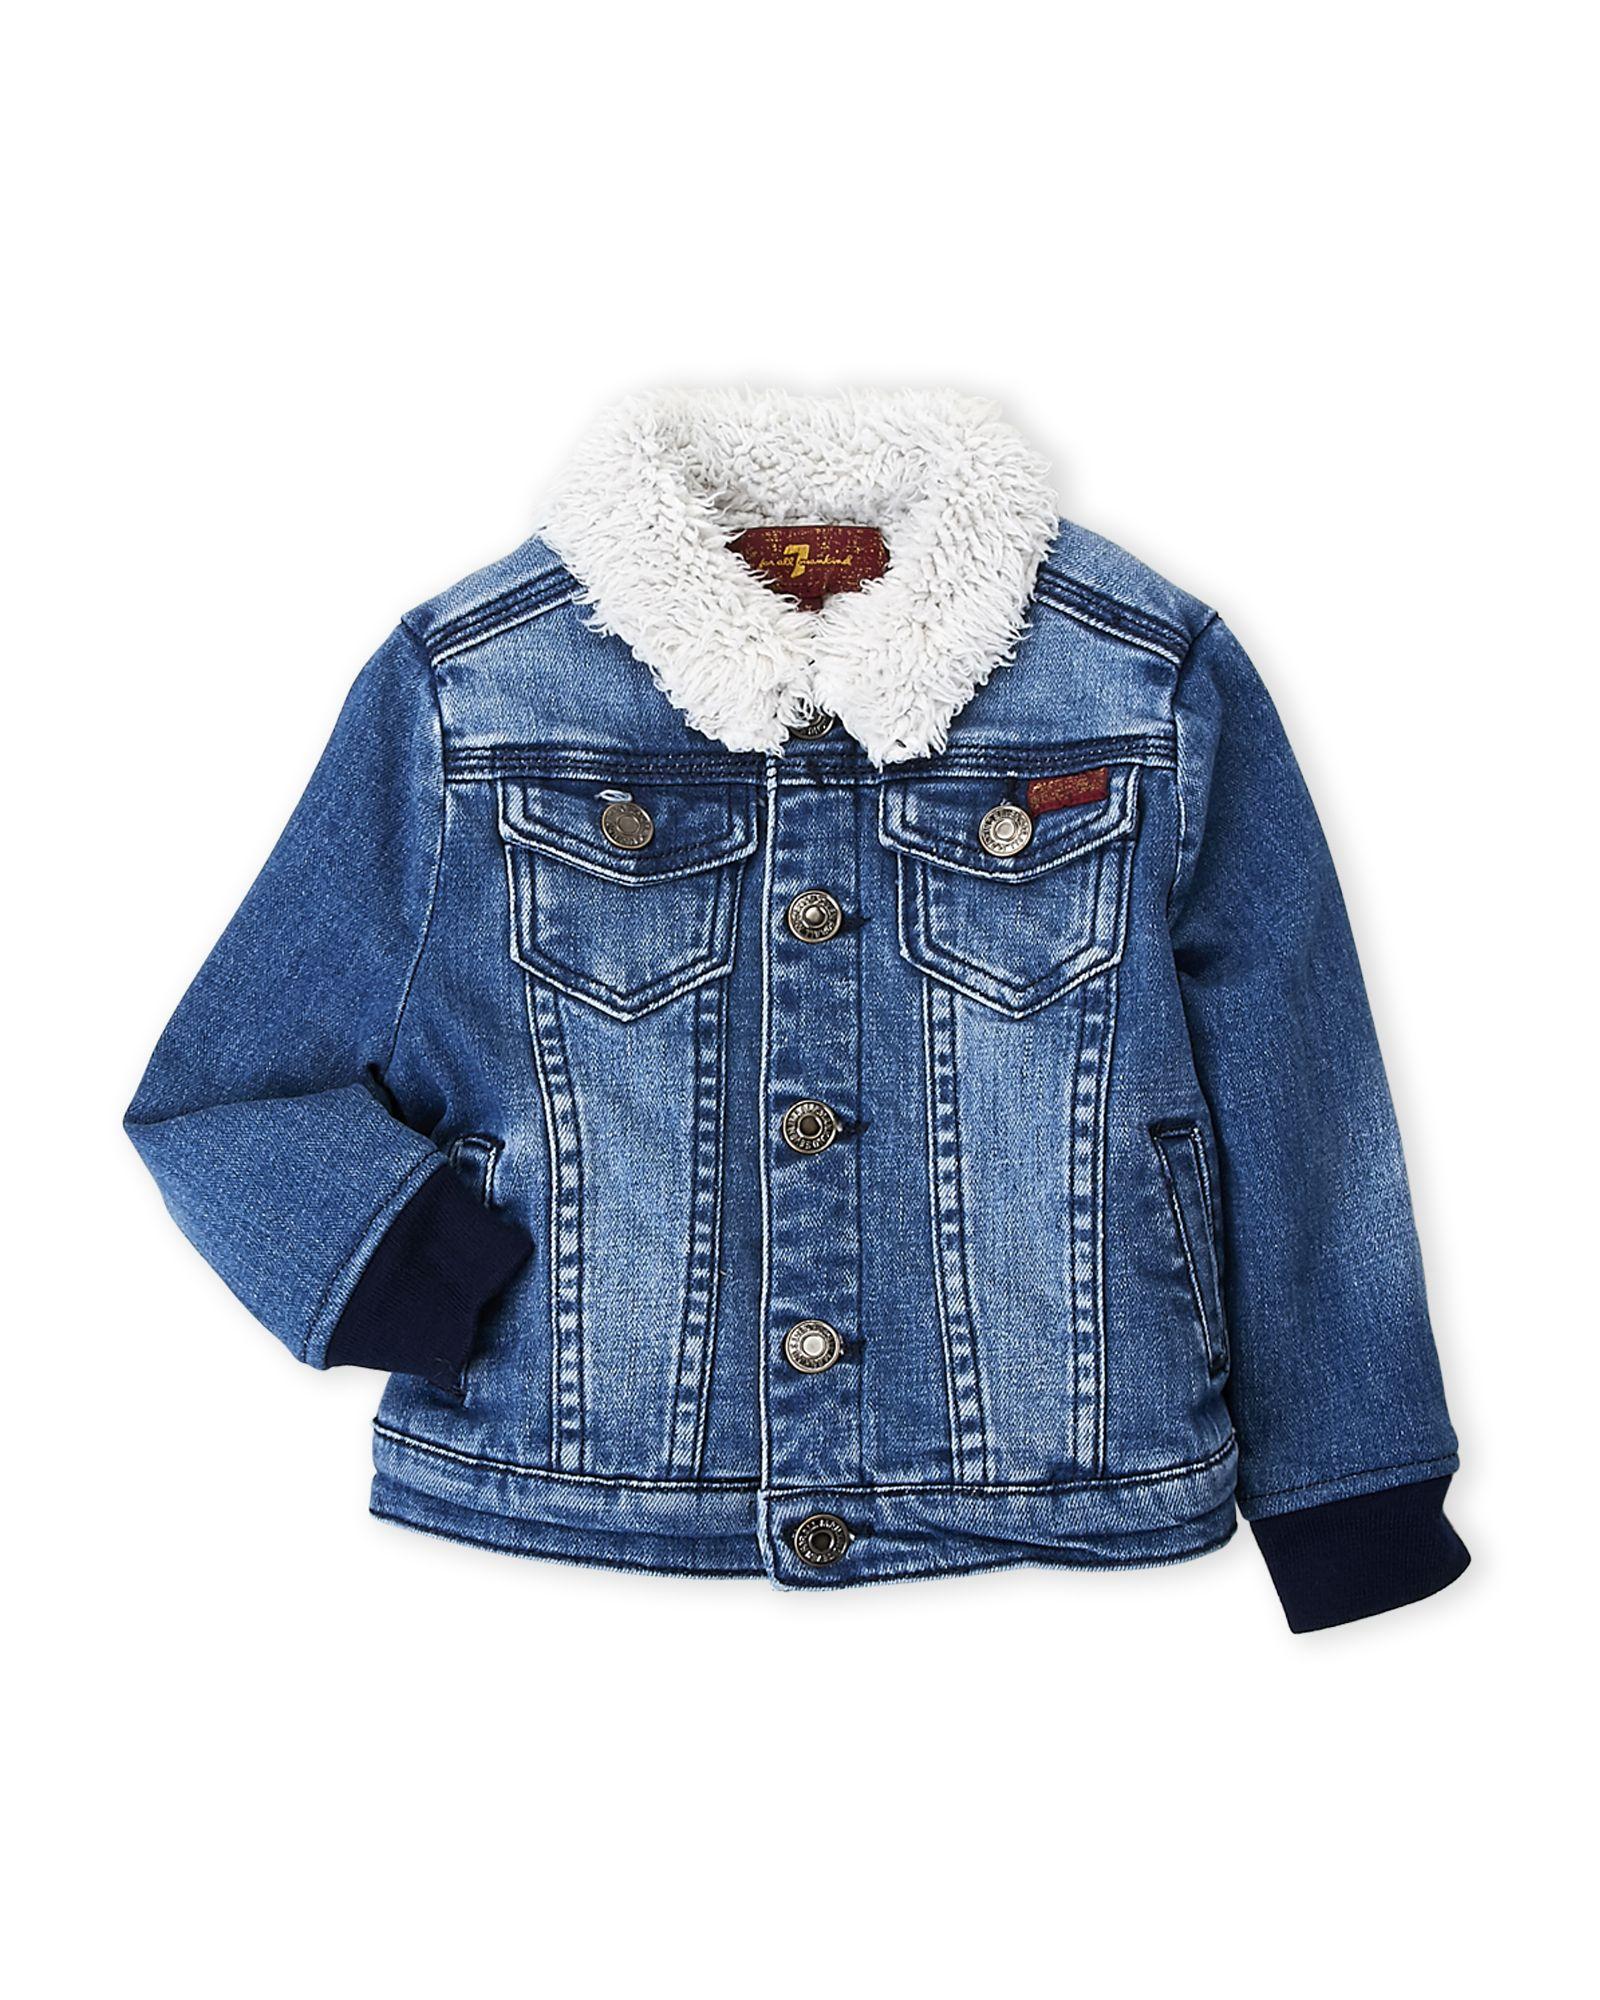 e7f2fa06c3c Toddler Boys) Faux Fur-Lined Denim Jacket   *Apparel & Accessories ...